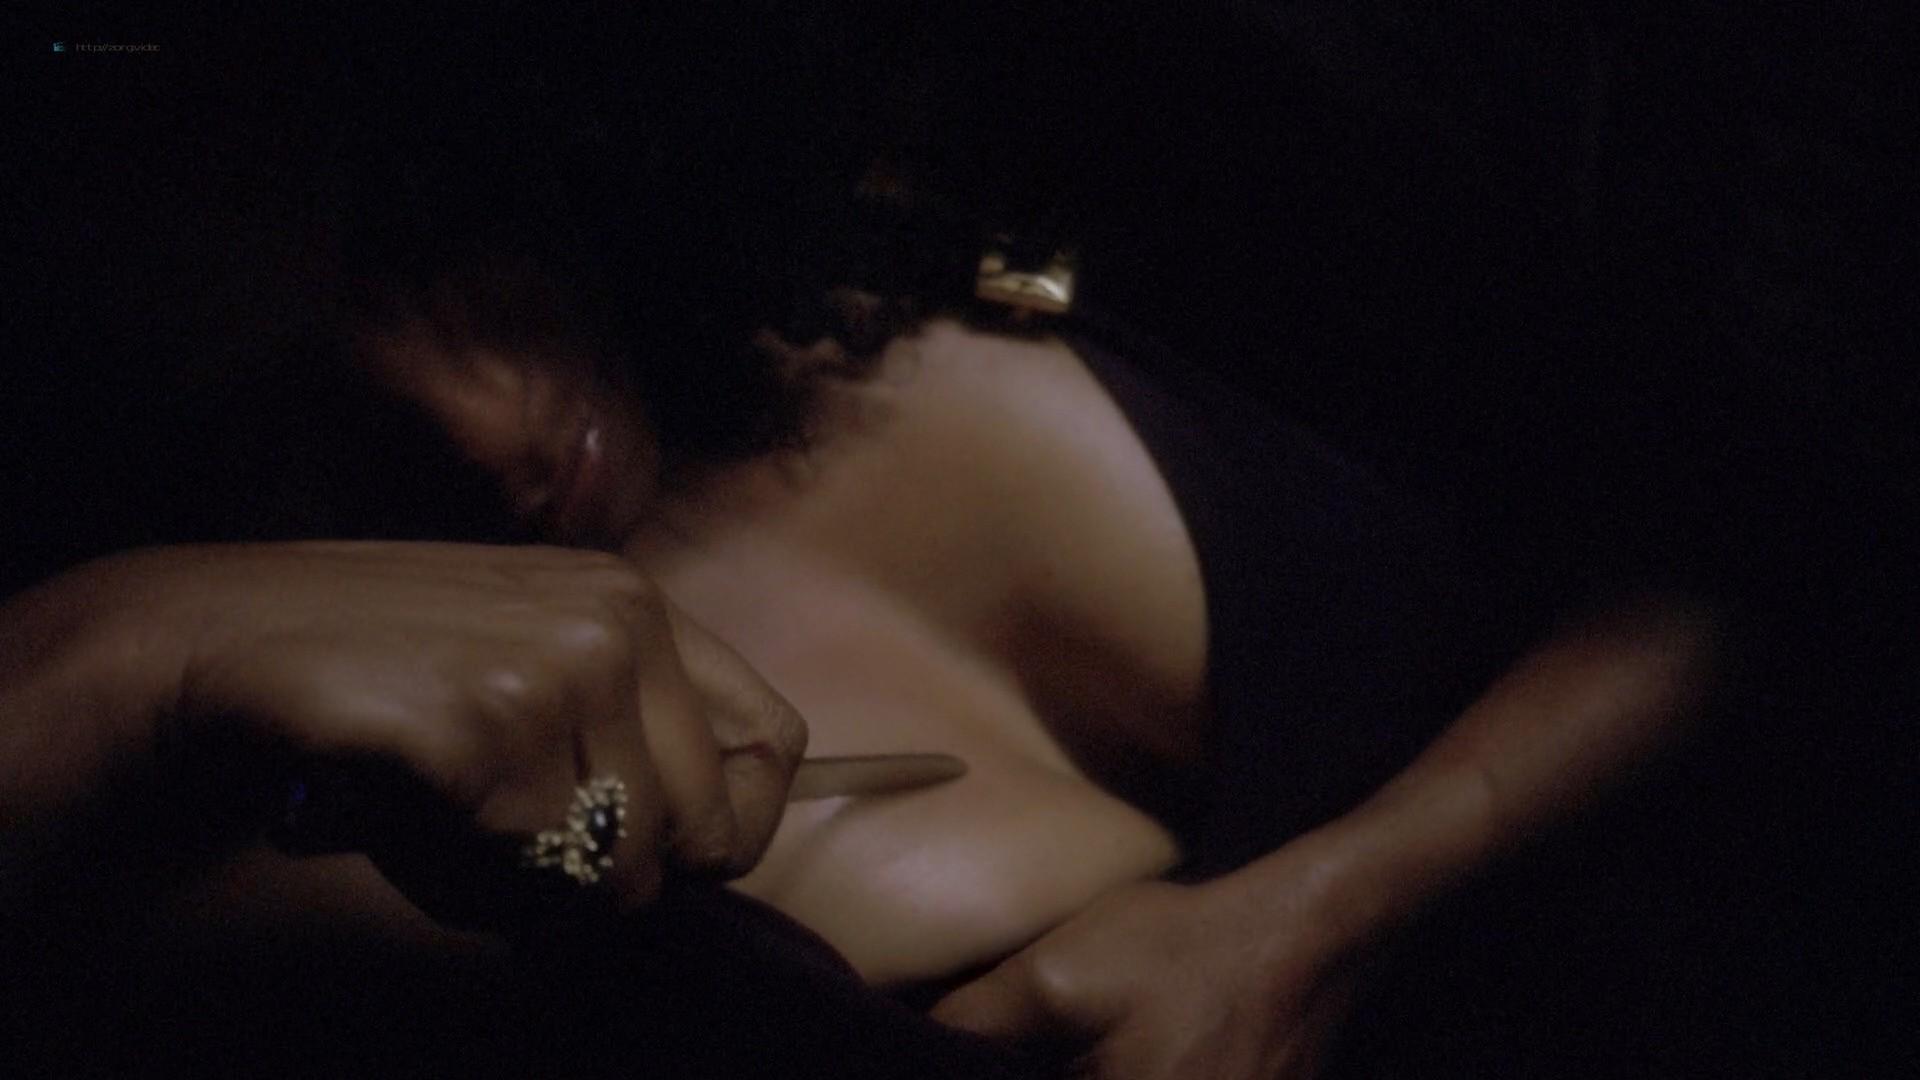 Lady Gaga and Angela Bassett hot lesbian sex - American Horror Story (2015) s5e3 HD 1080p (1)